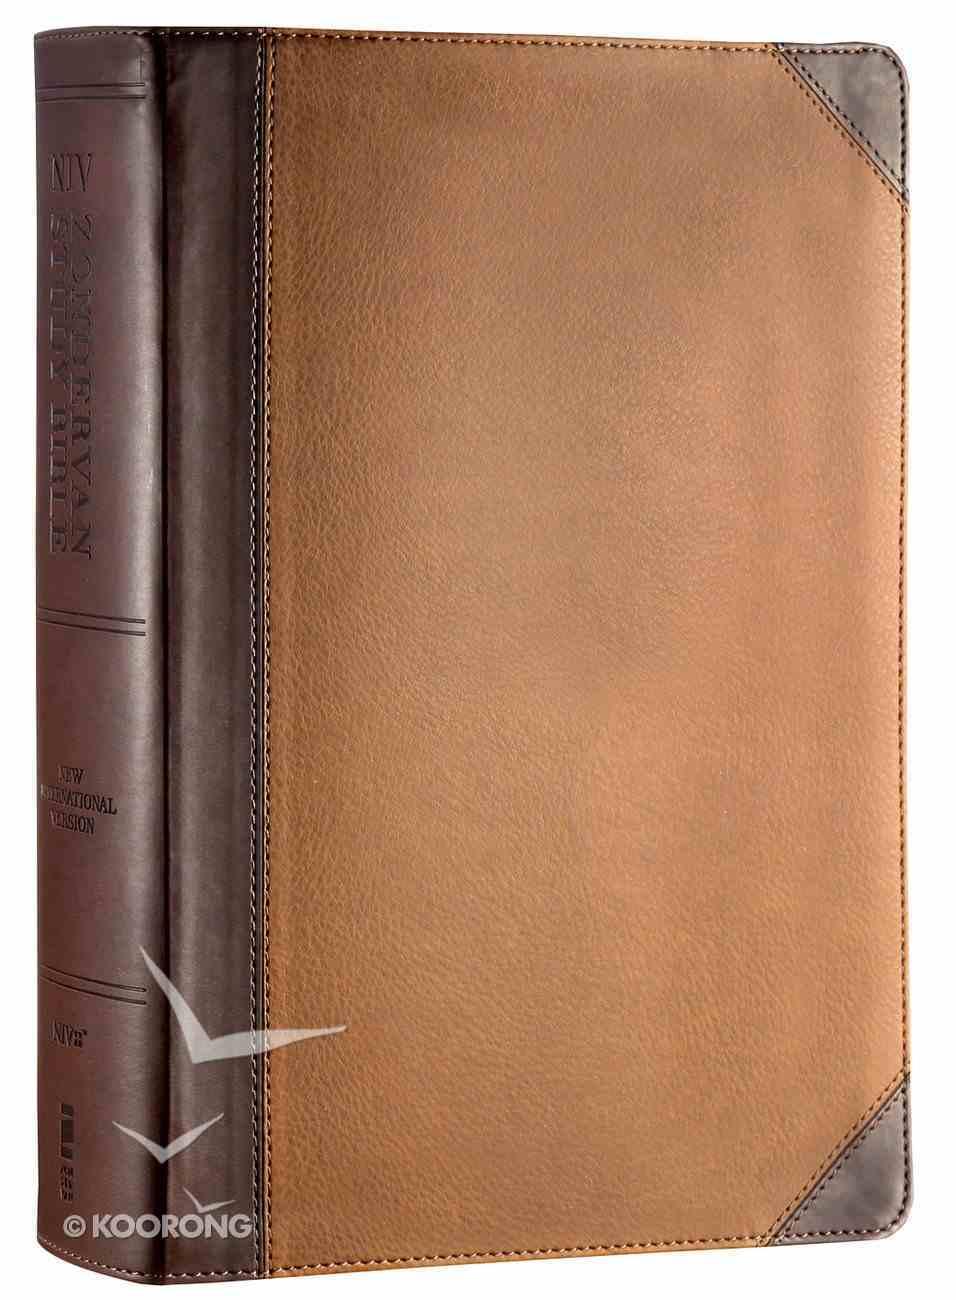 NIV Zondervan Study Bible Full Colour Large Print Chocolate Caramel Premium Imitation Leather